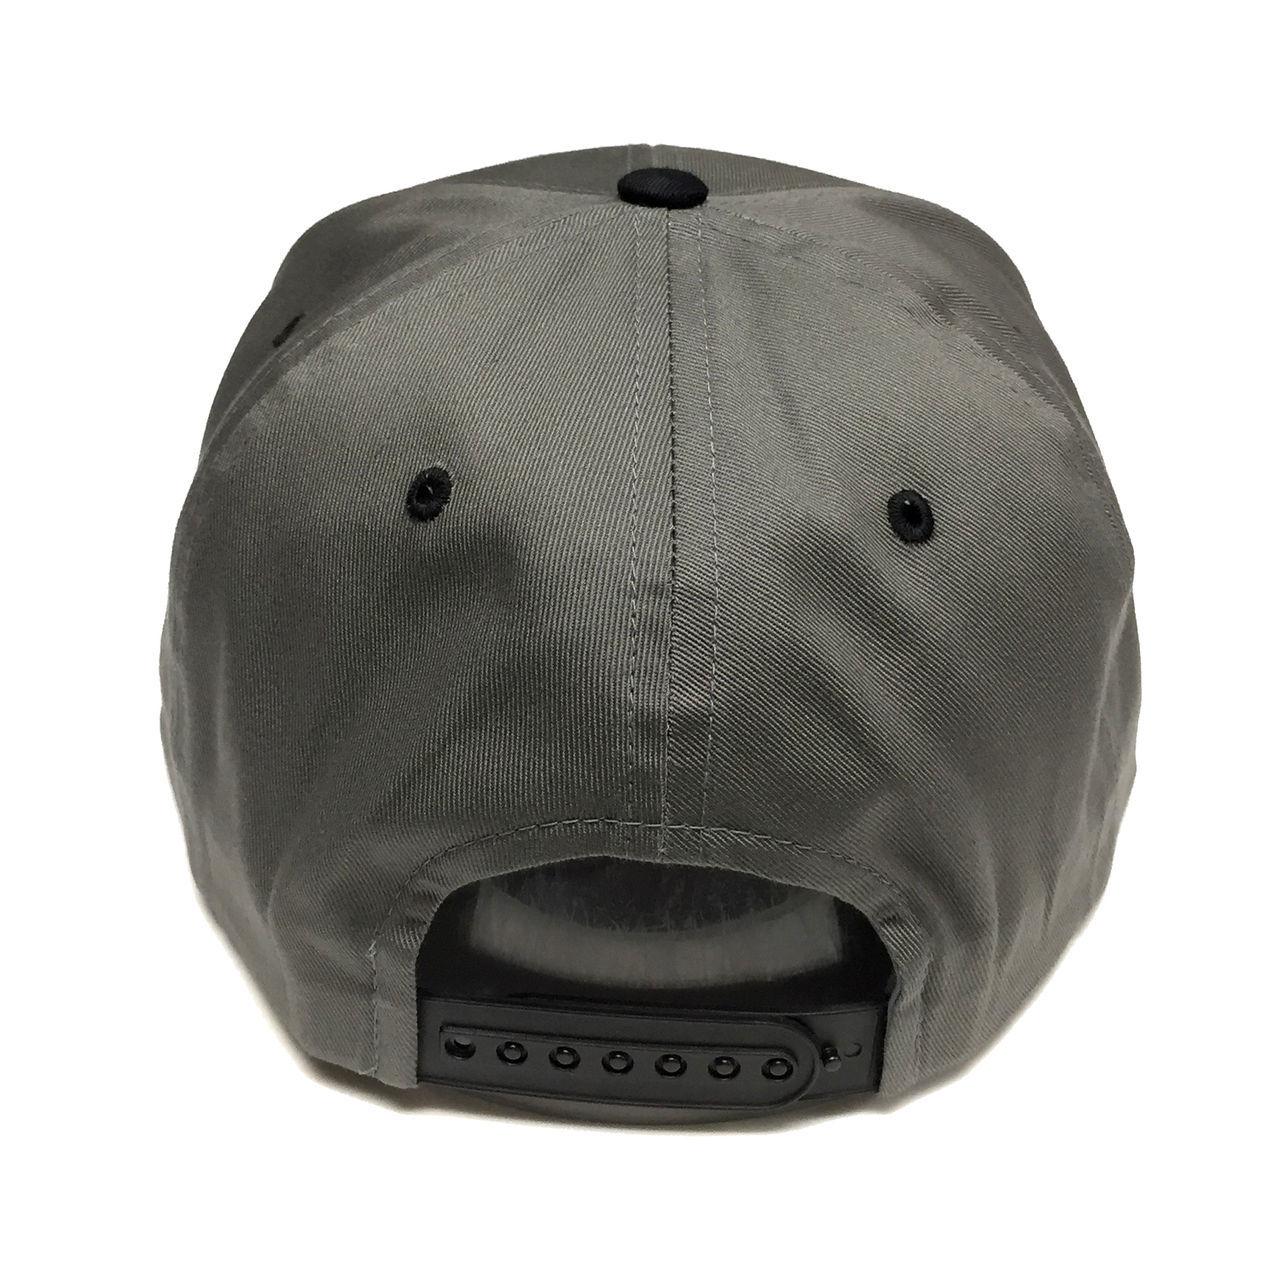 6c7c9639e48 Zephyr NHL Los Angeles Kings Hat Gray Black Vintage Retro Snapback Cap